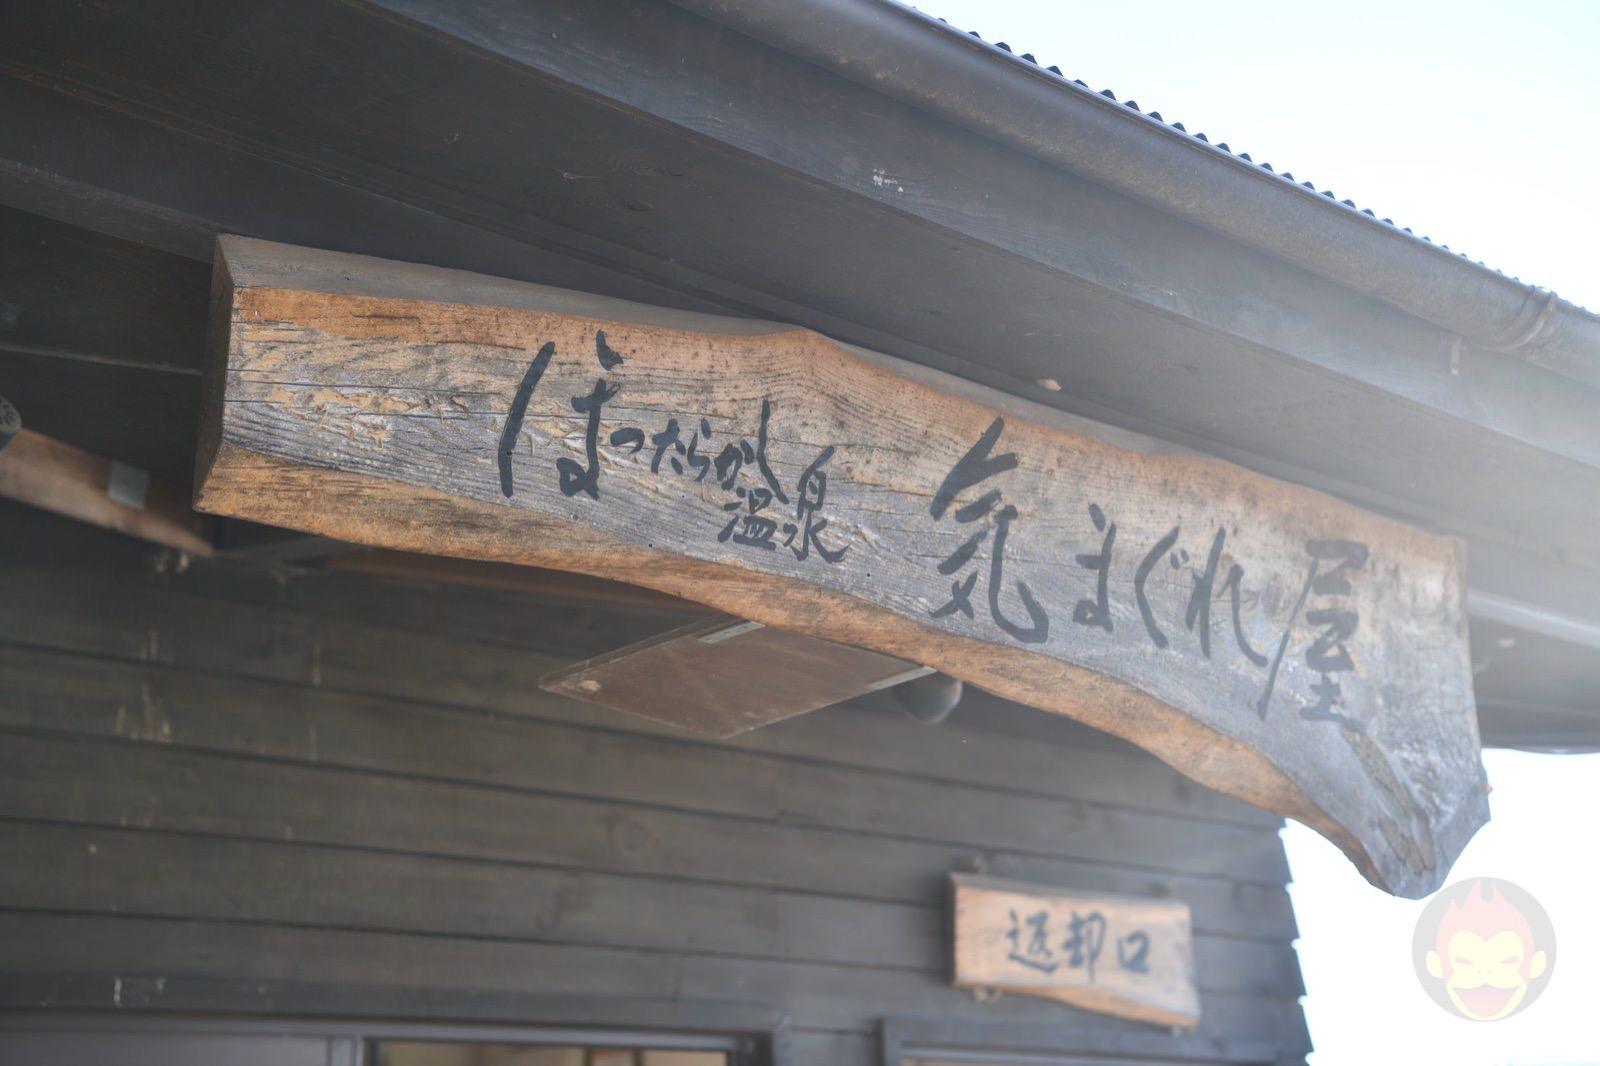 Yamanashi Hottarakashi Onsen JTC21 38